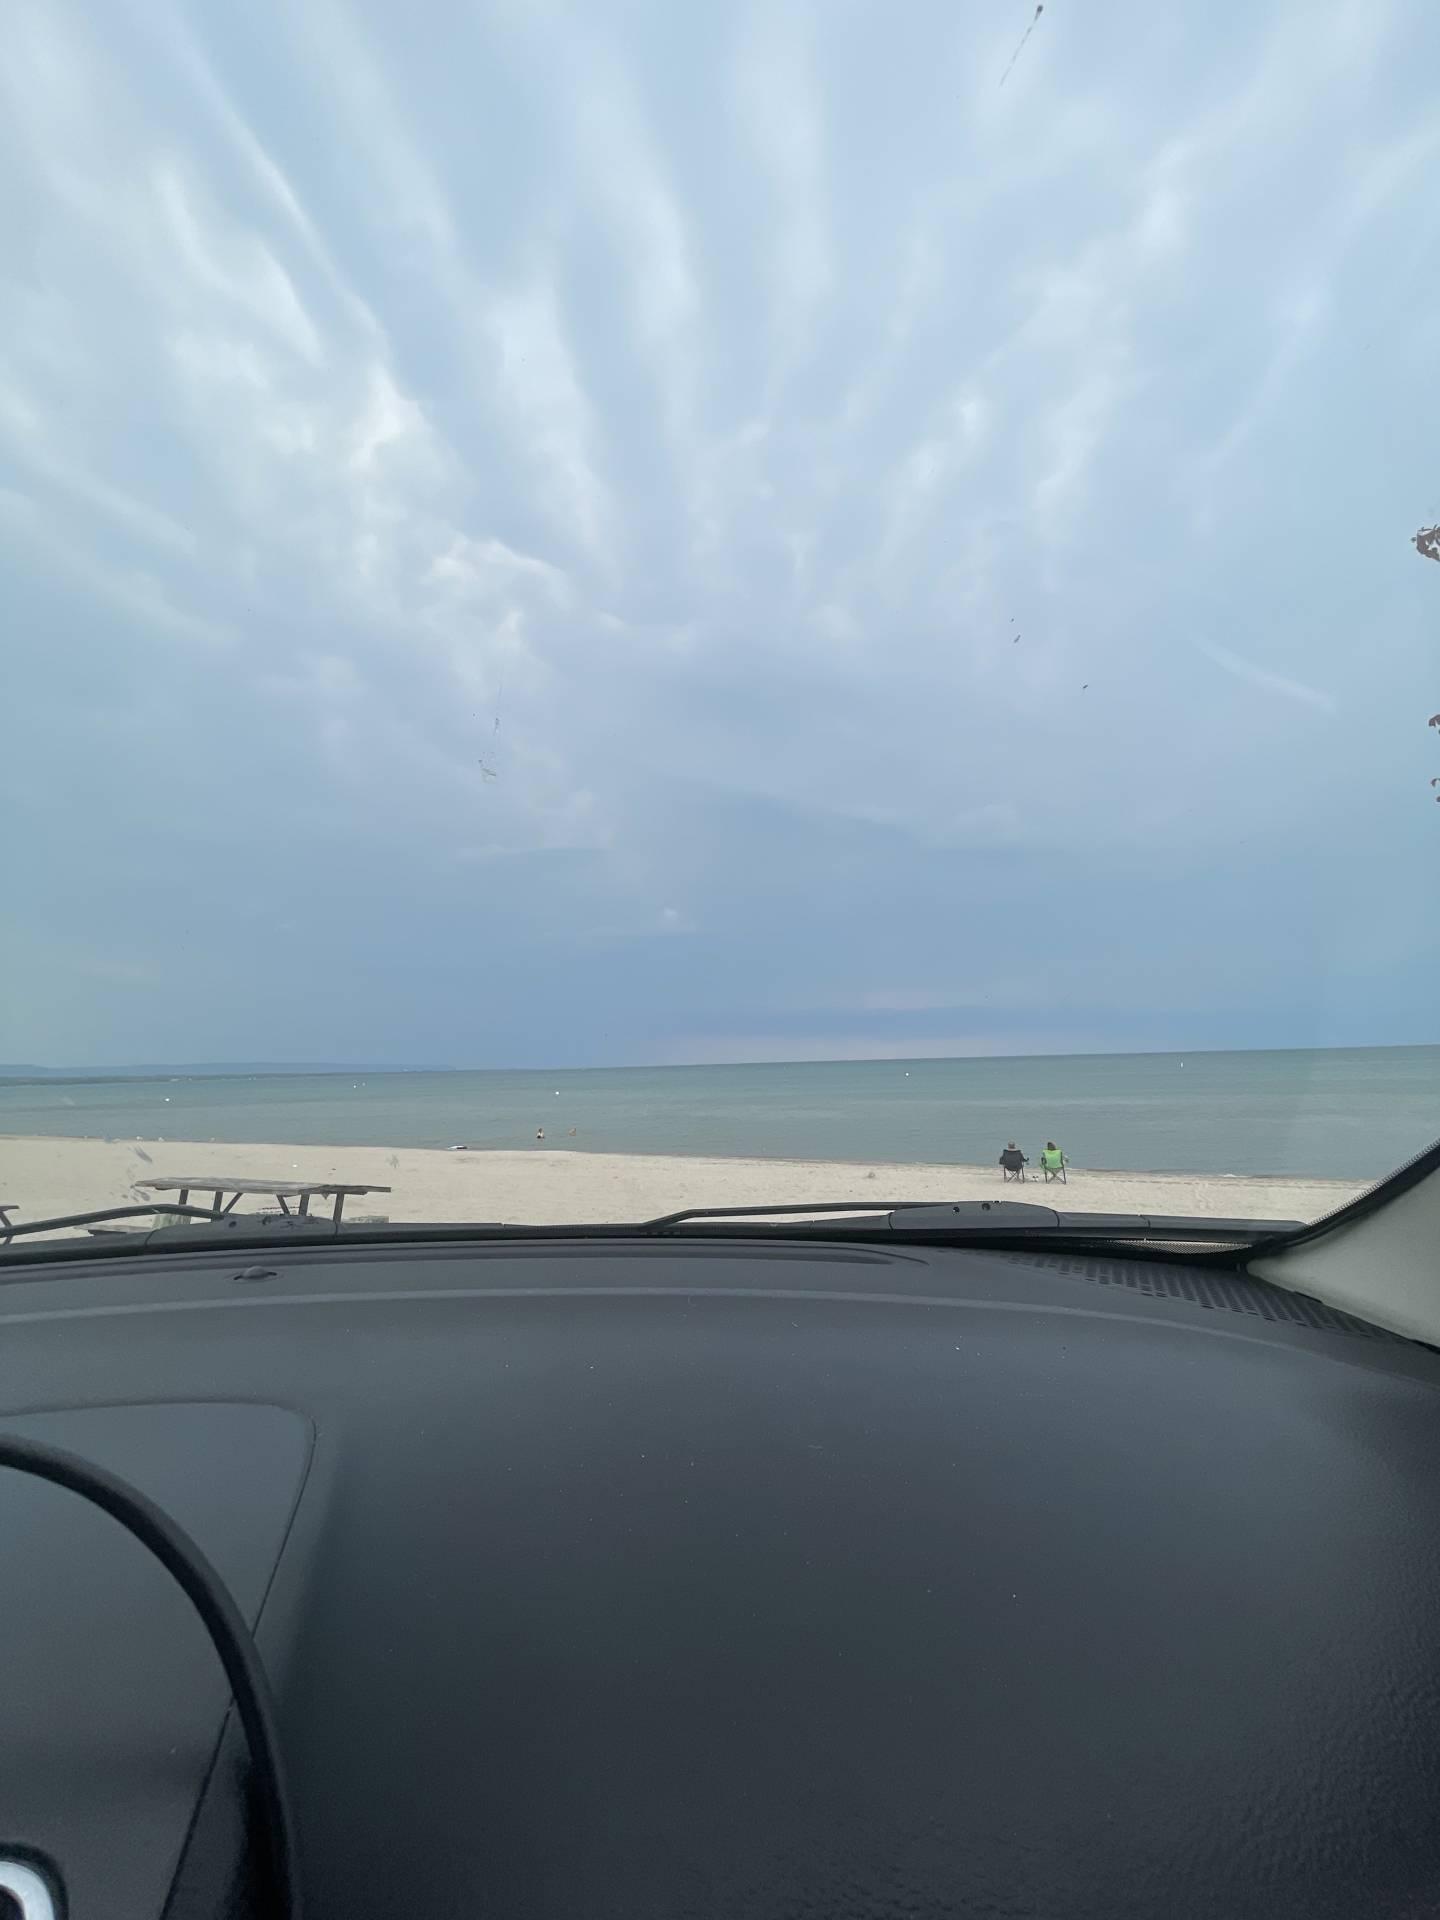 The waiting game begins, at Wasaga Beach currently #ONstorm   Wasaga Beach, ON